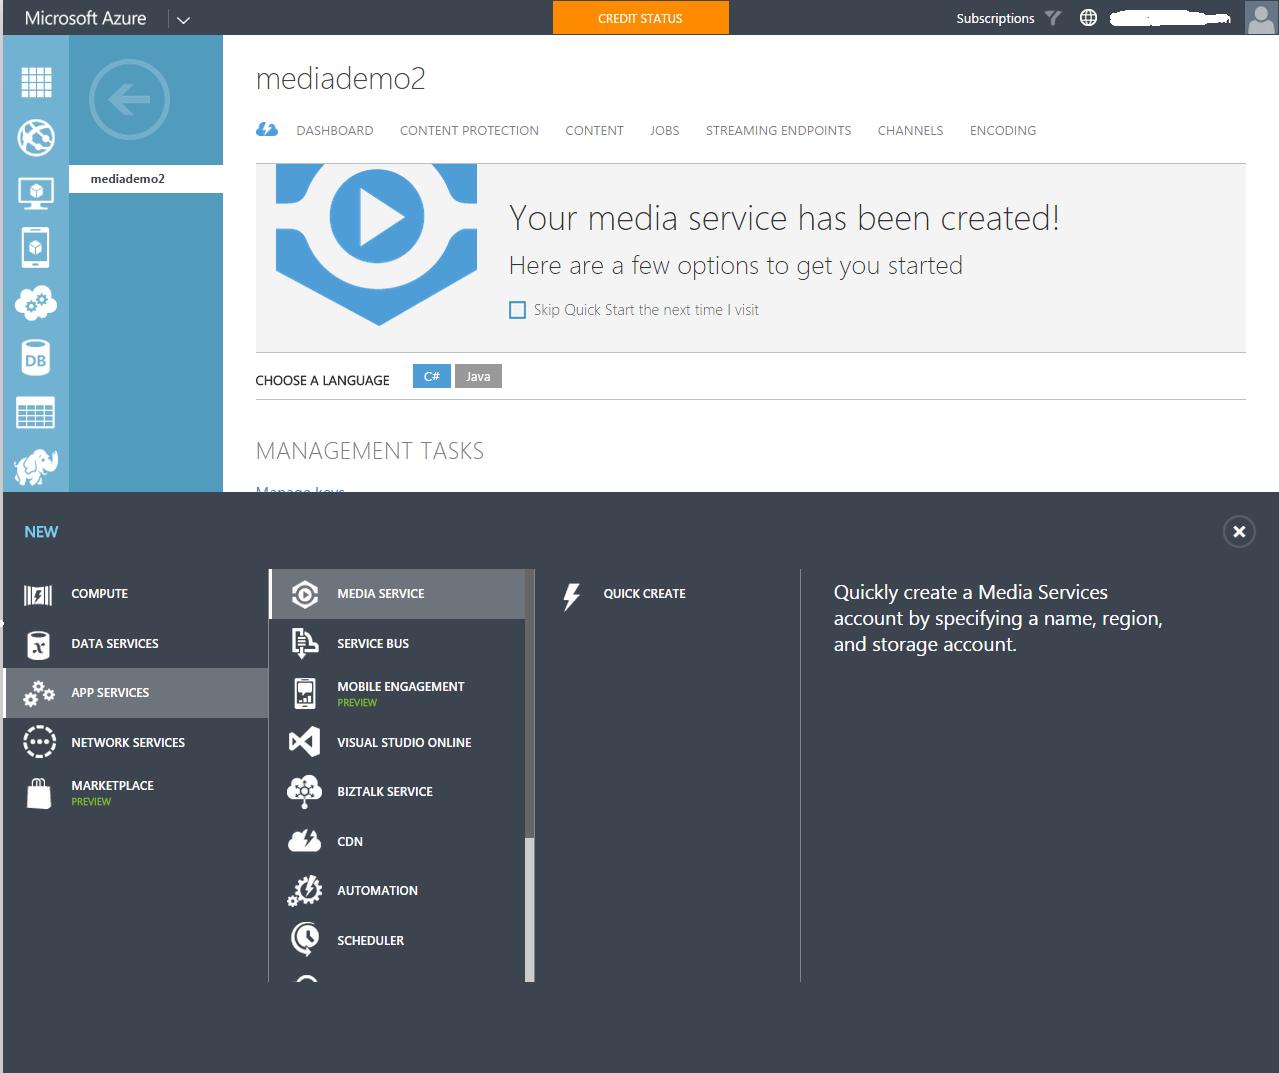 Provision Azure Media Services Account